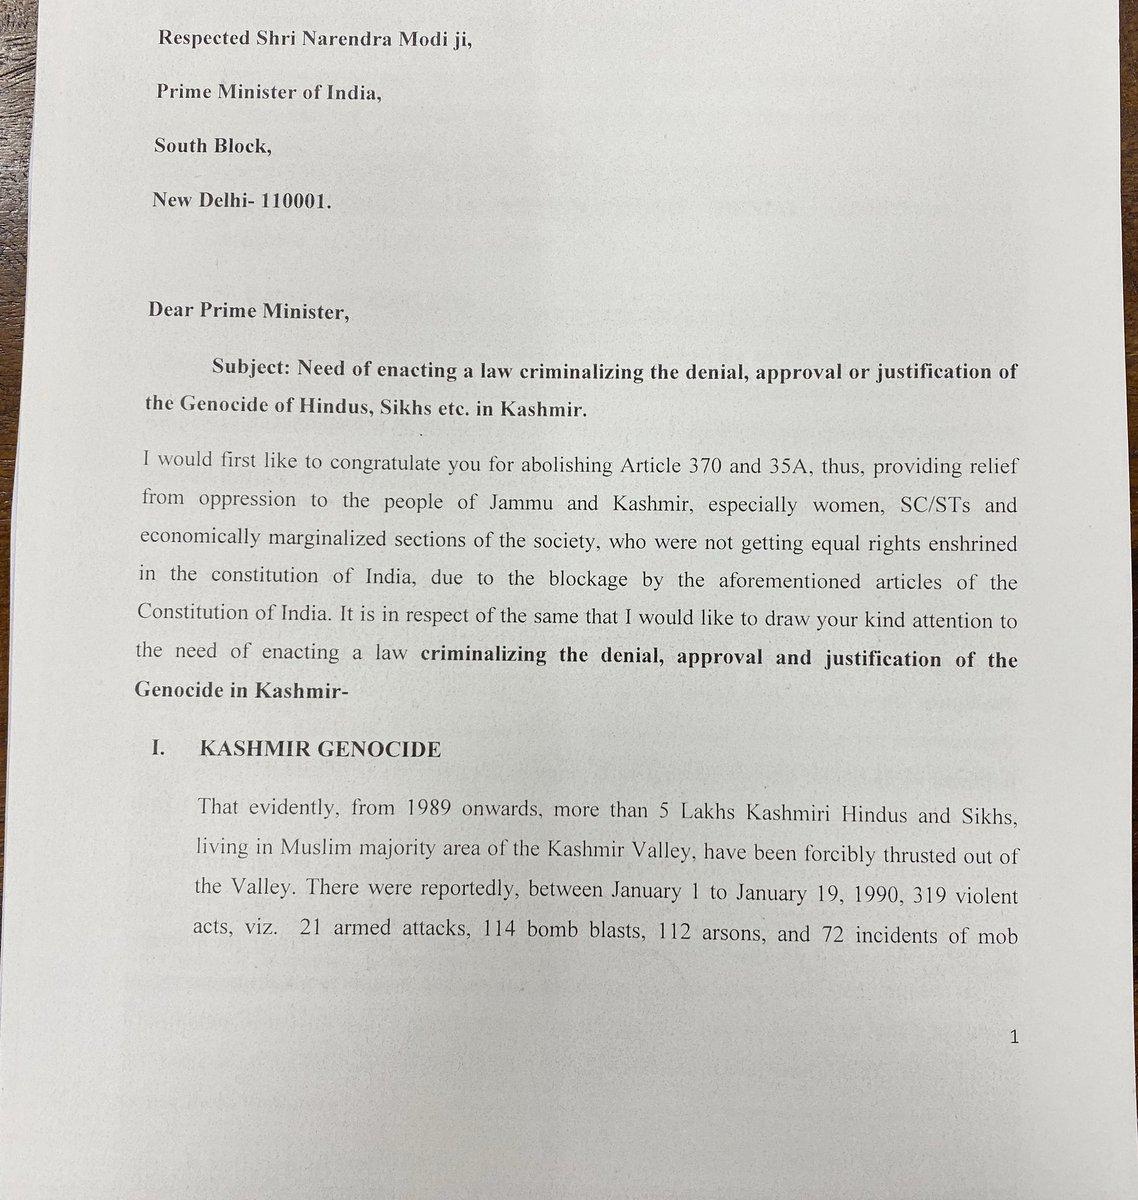 RT @ishkarnBHANDARI: My letter to Hon'ble PM @narendramodi & HM @AmitShah on NEED to make law criminalising whitewashing of KASHMIR GENOCIDE by journalist, Bollywood etcRetweet if u agree1/2